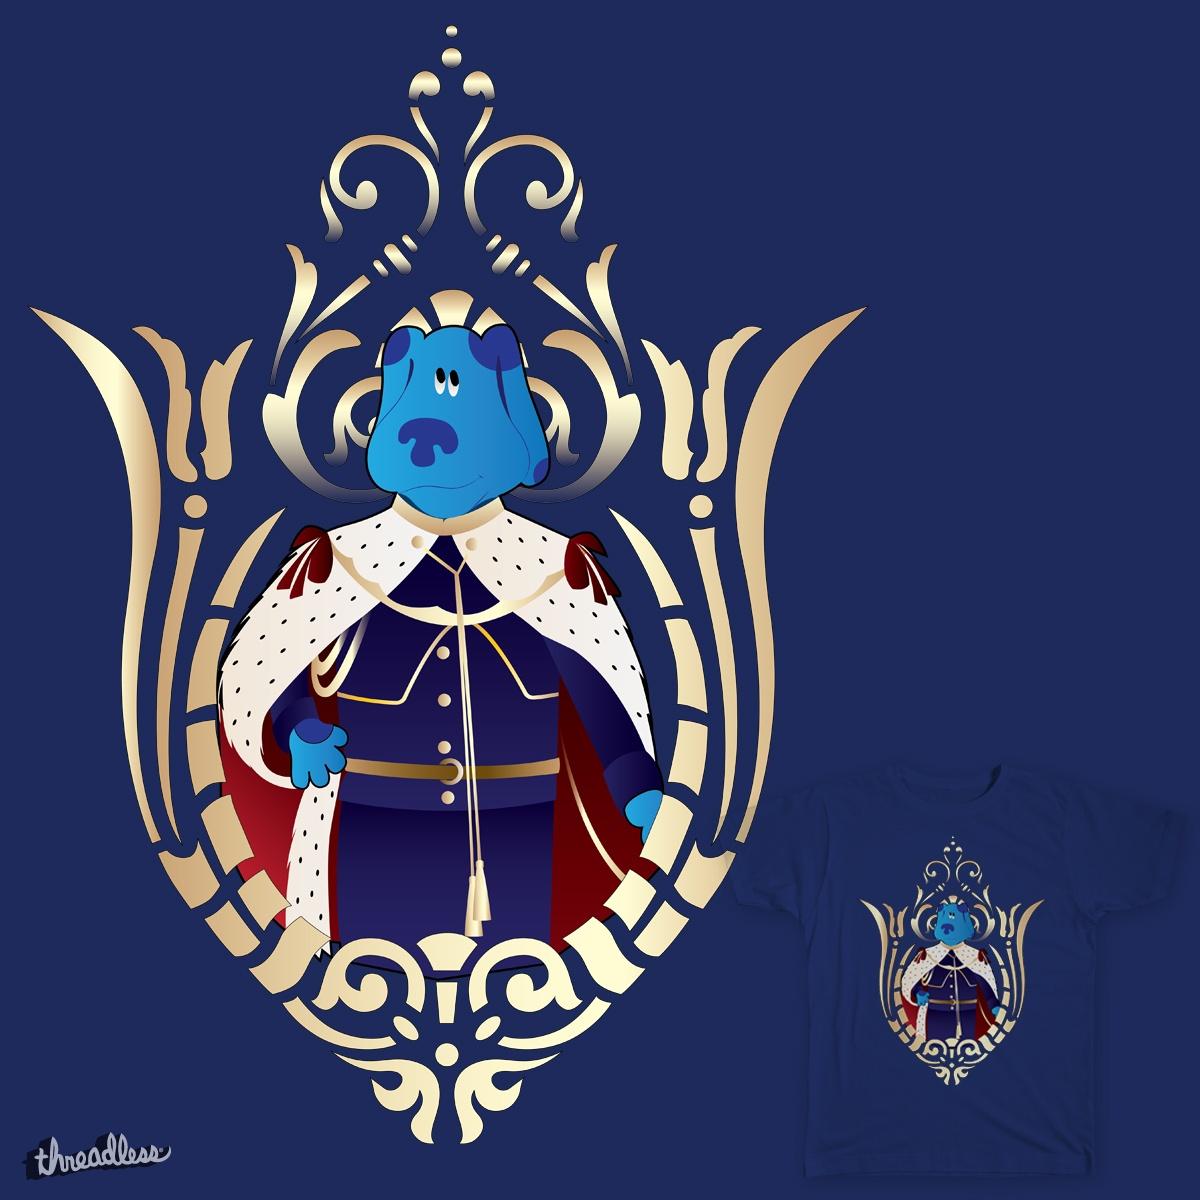 Royal Blue by JabNYC on Threadless